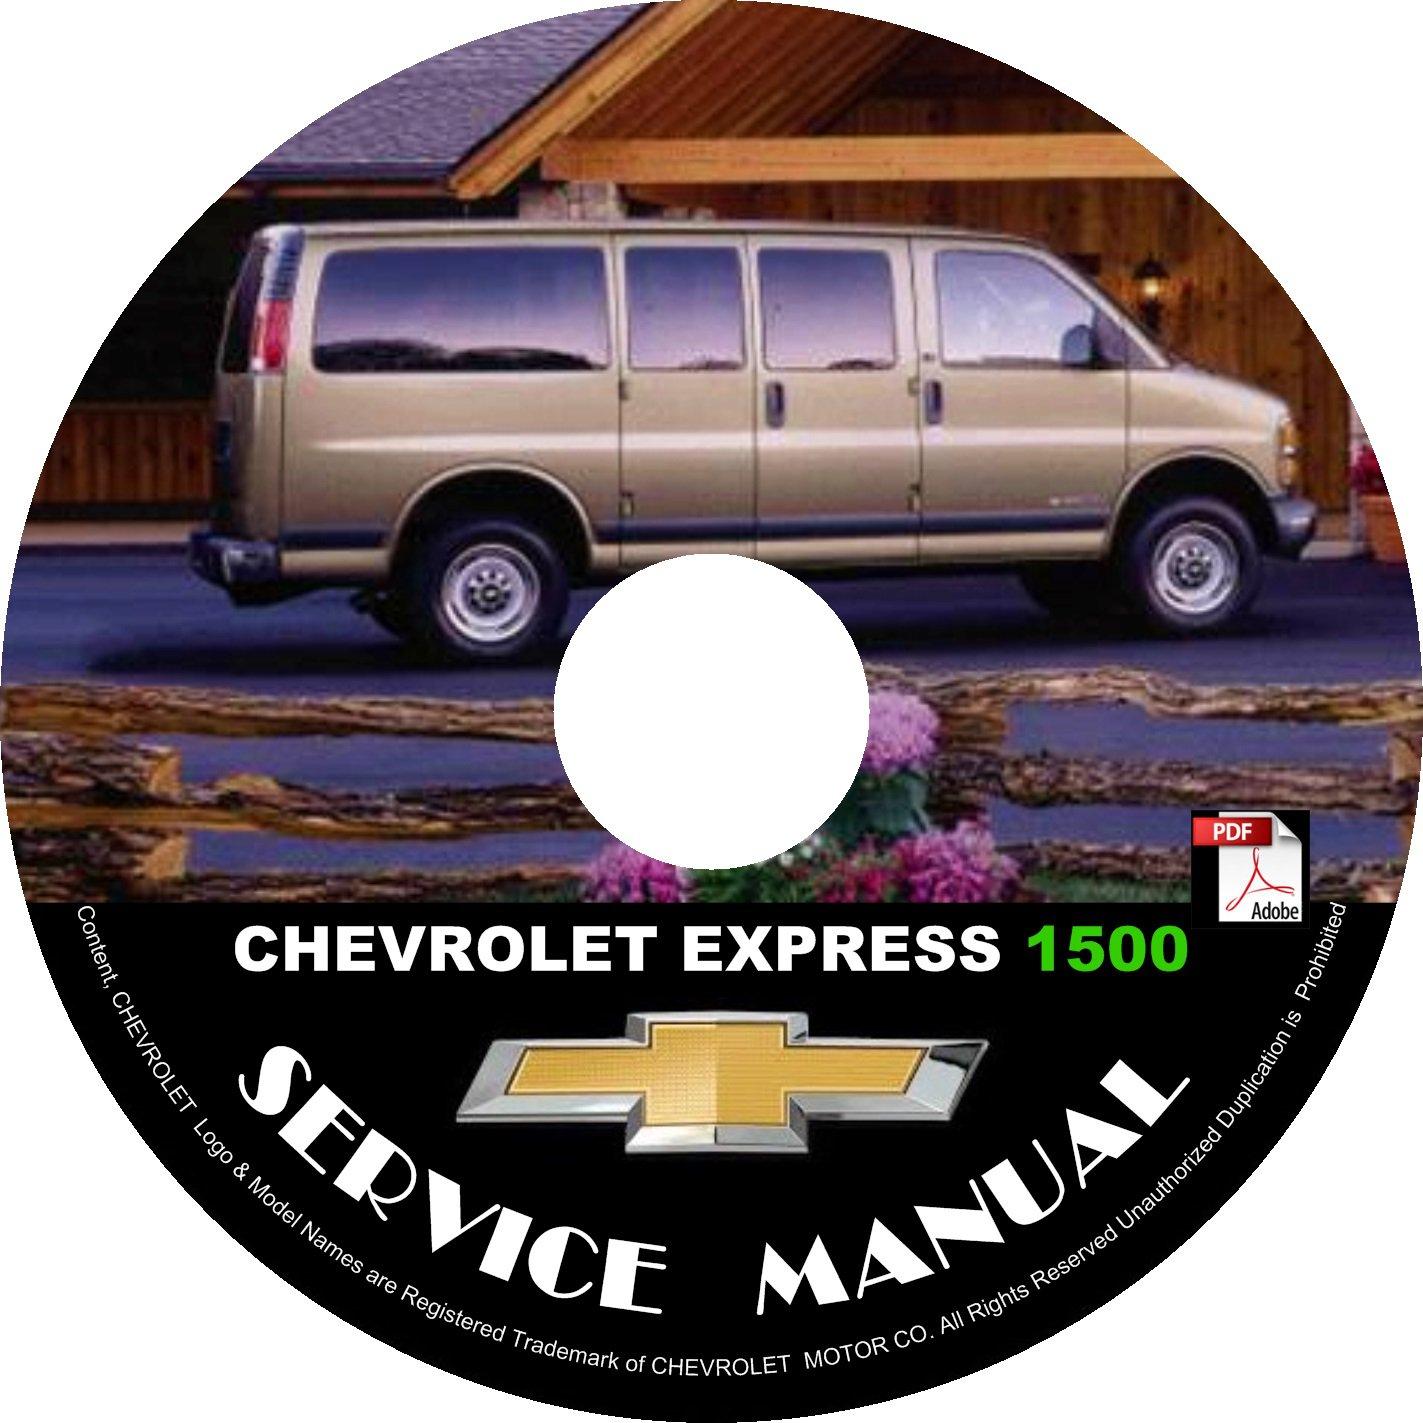 2002 Chevrolet Express 1500 G1500 Service Repair Shop Manual on CD Fix Repair Rebuild Workshop Guide